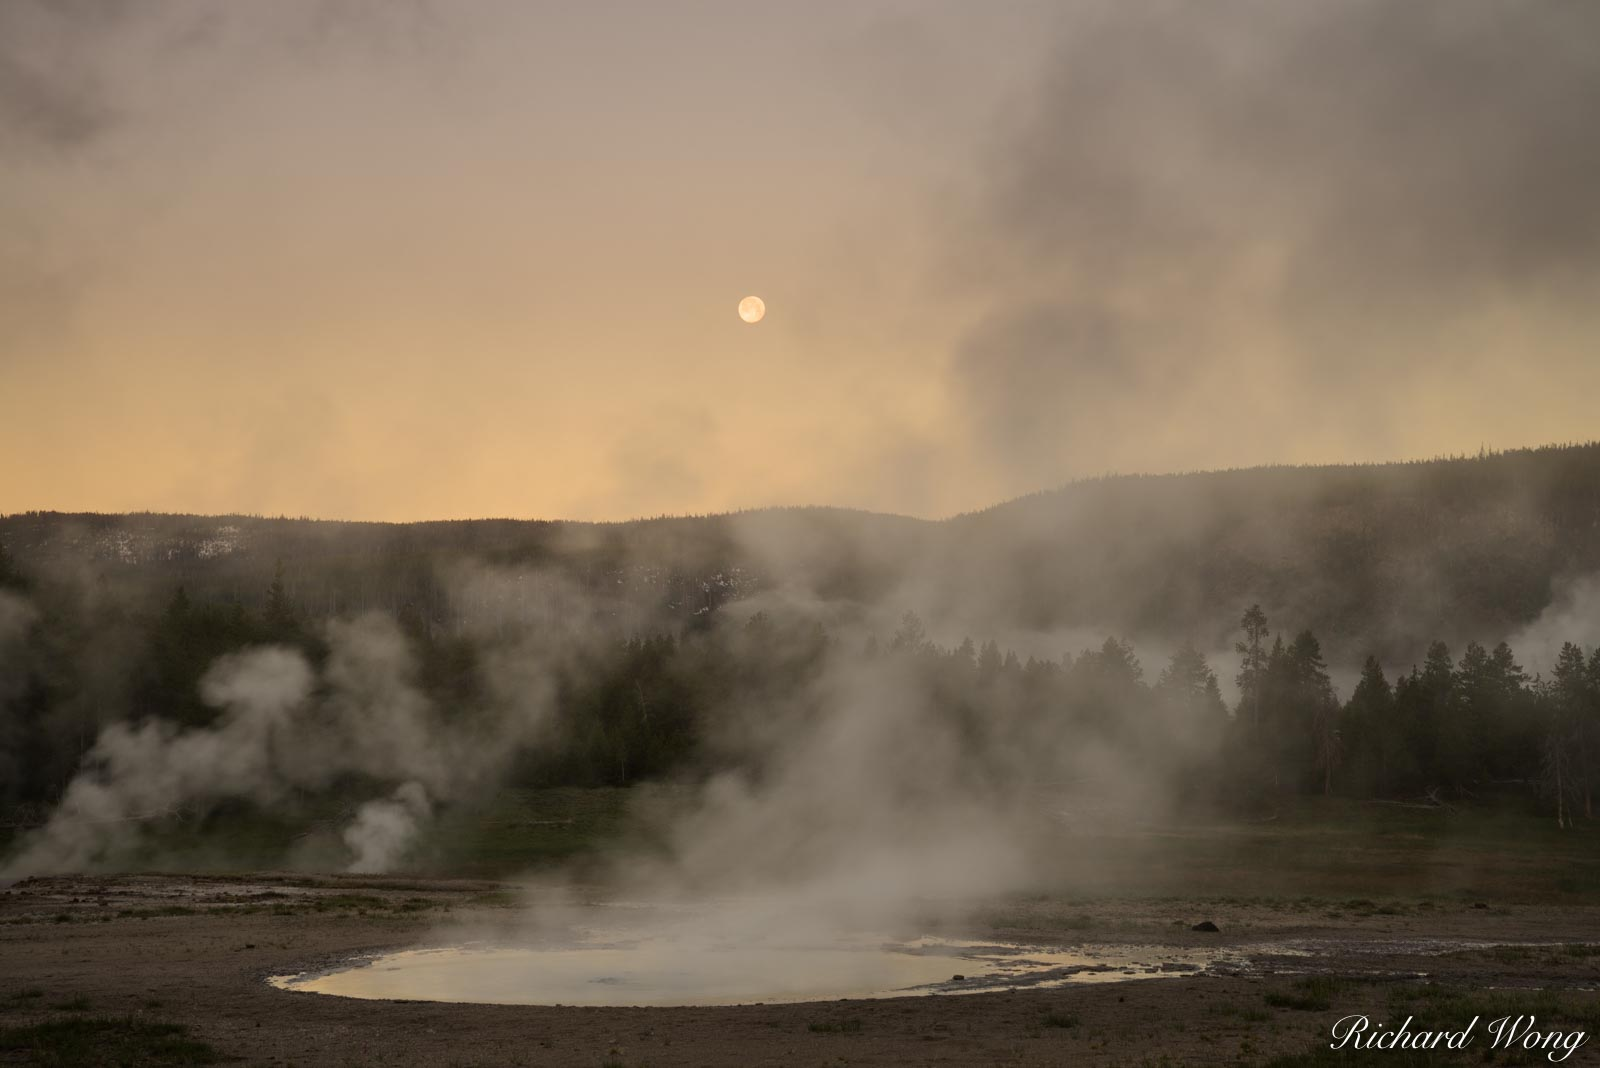 Upper Geyser Basin Sunrise & Full Moon, Yellowstone National Park, Wyoming, photo, photo